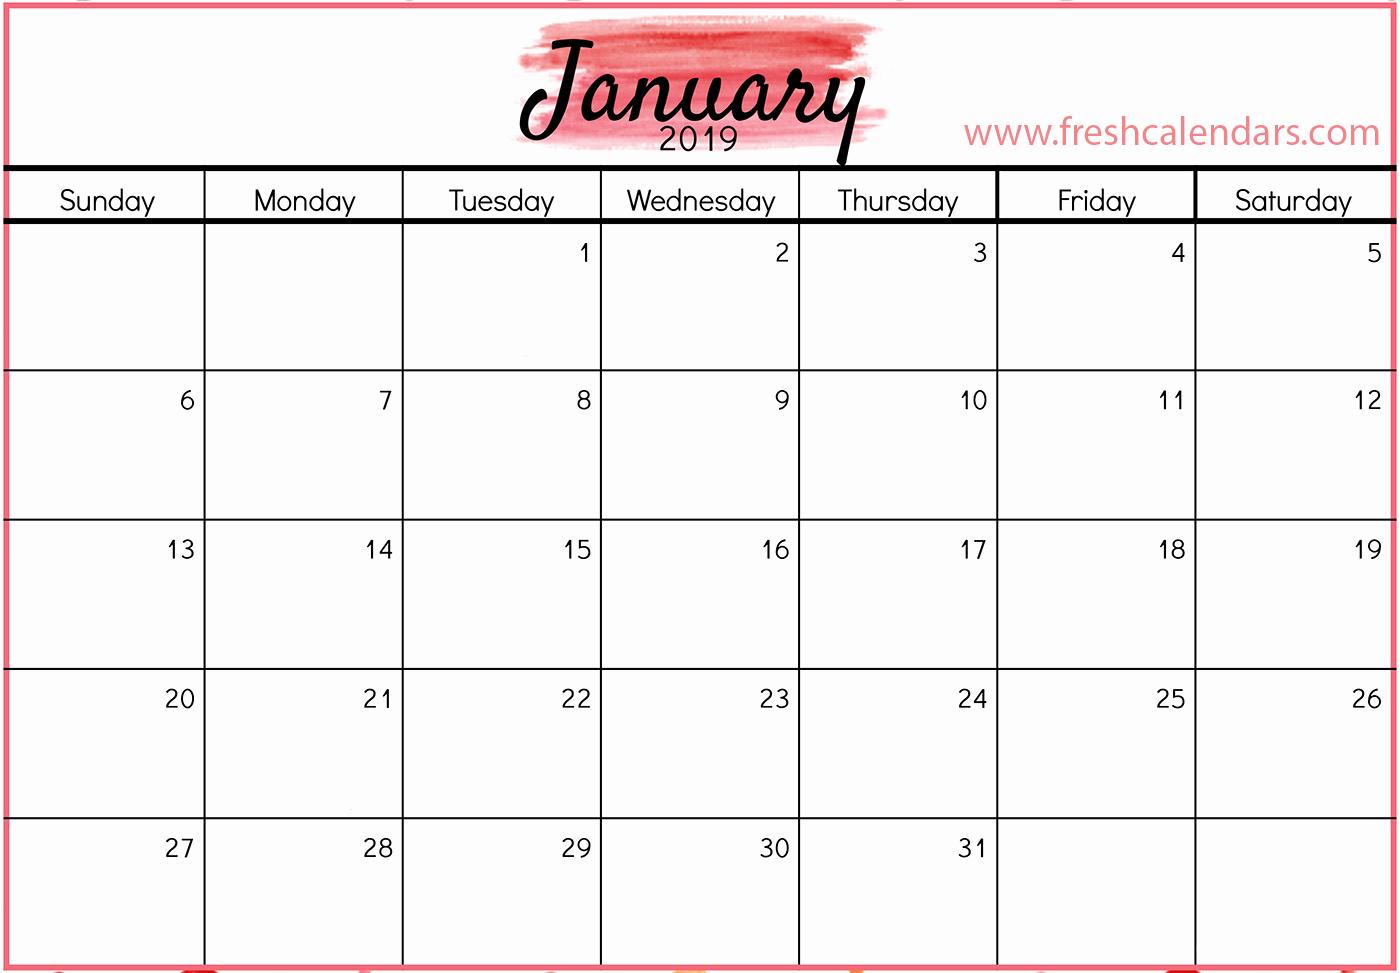 2019 Monthly Calendar Template Beautiful January 2019 Calendar Printable Fresh Calendars